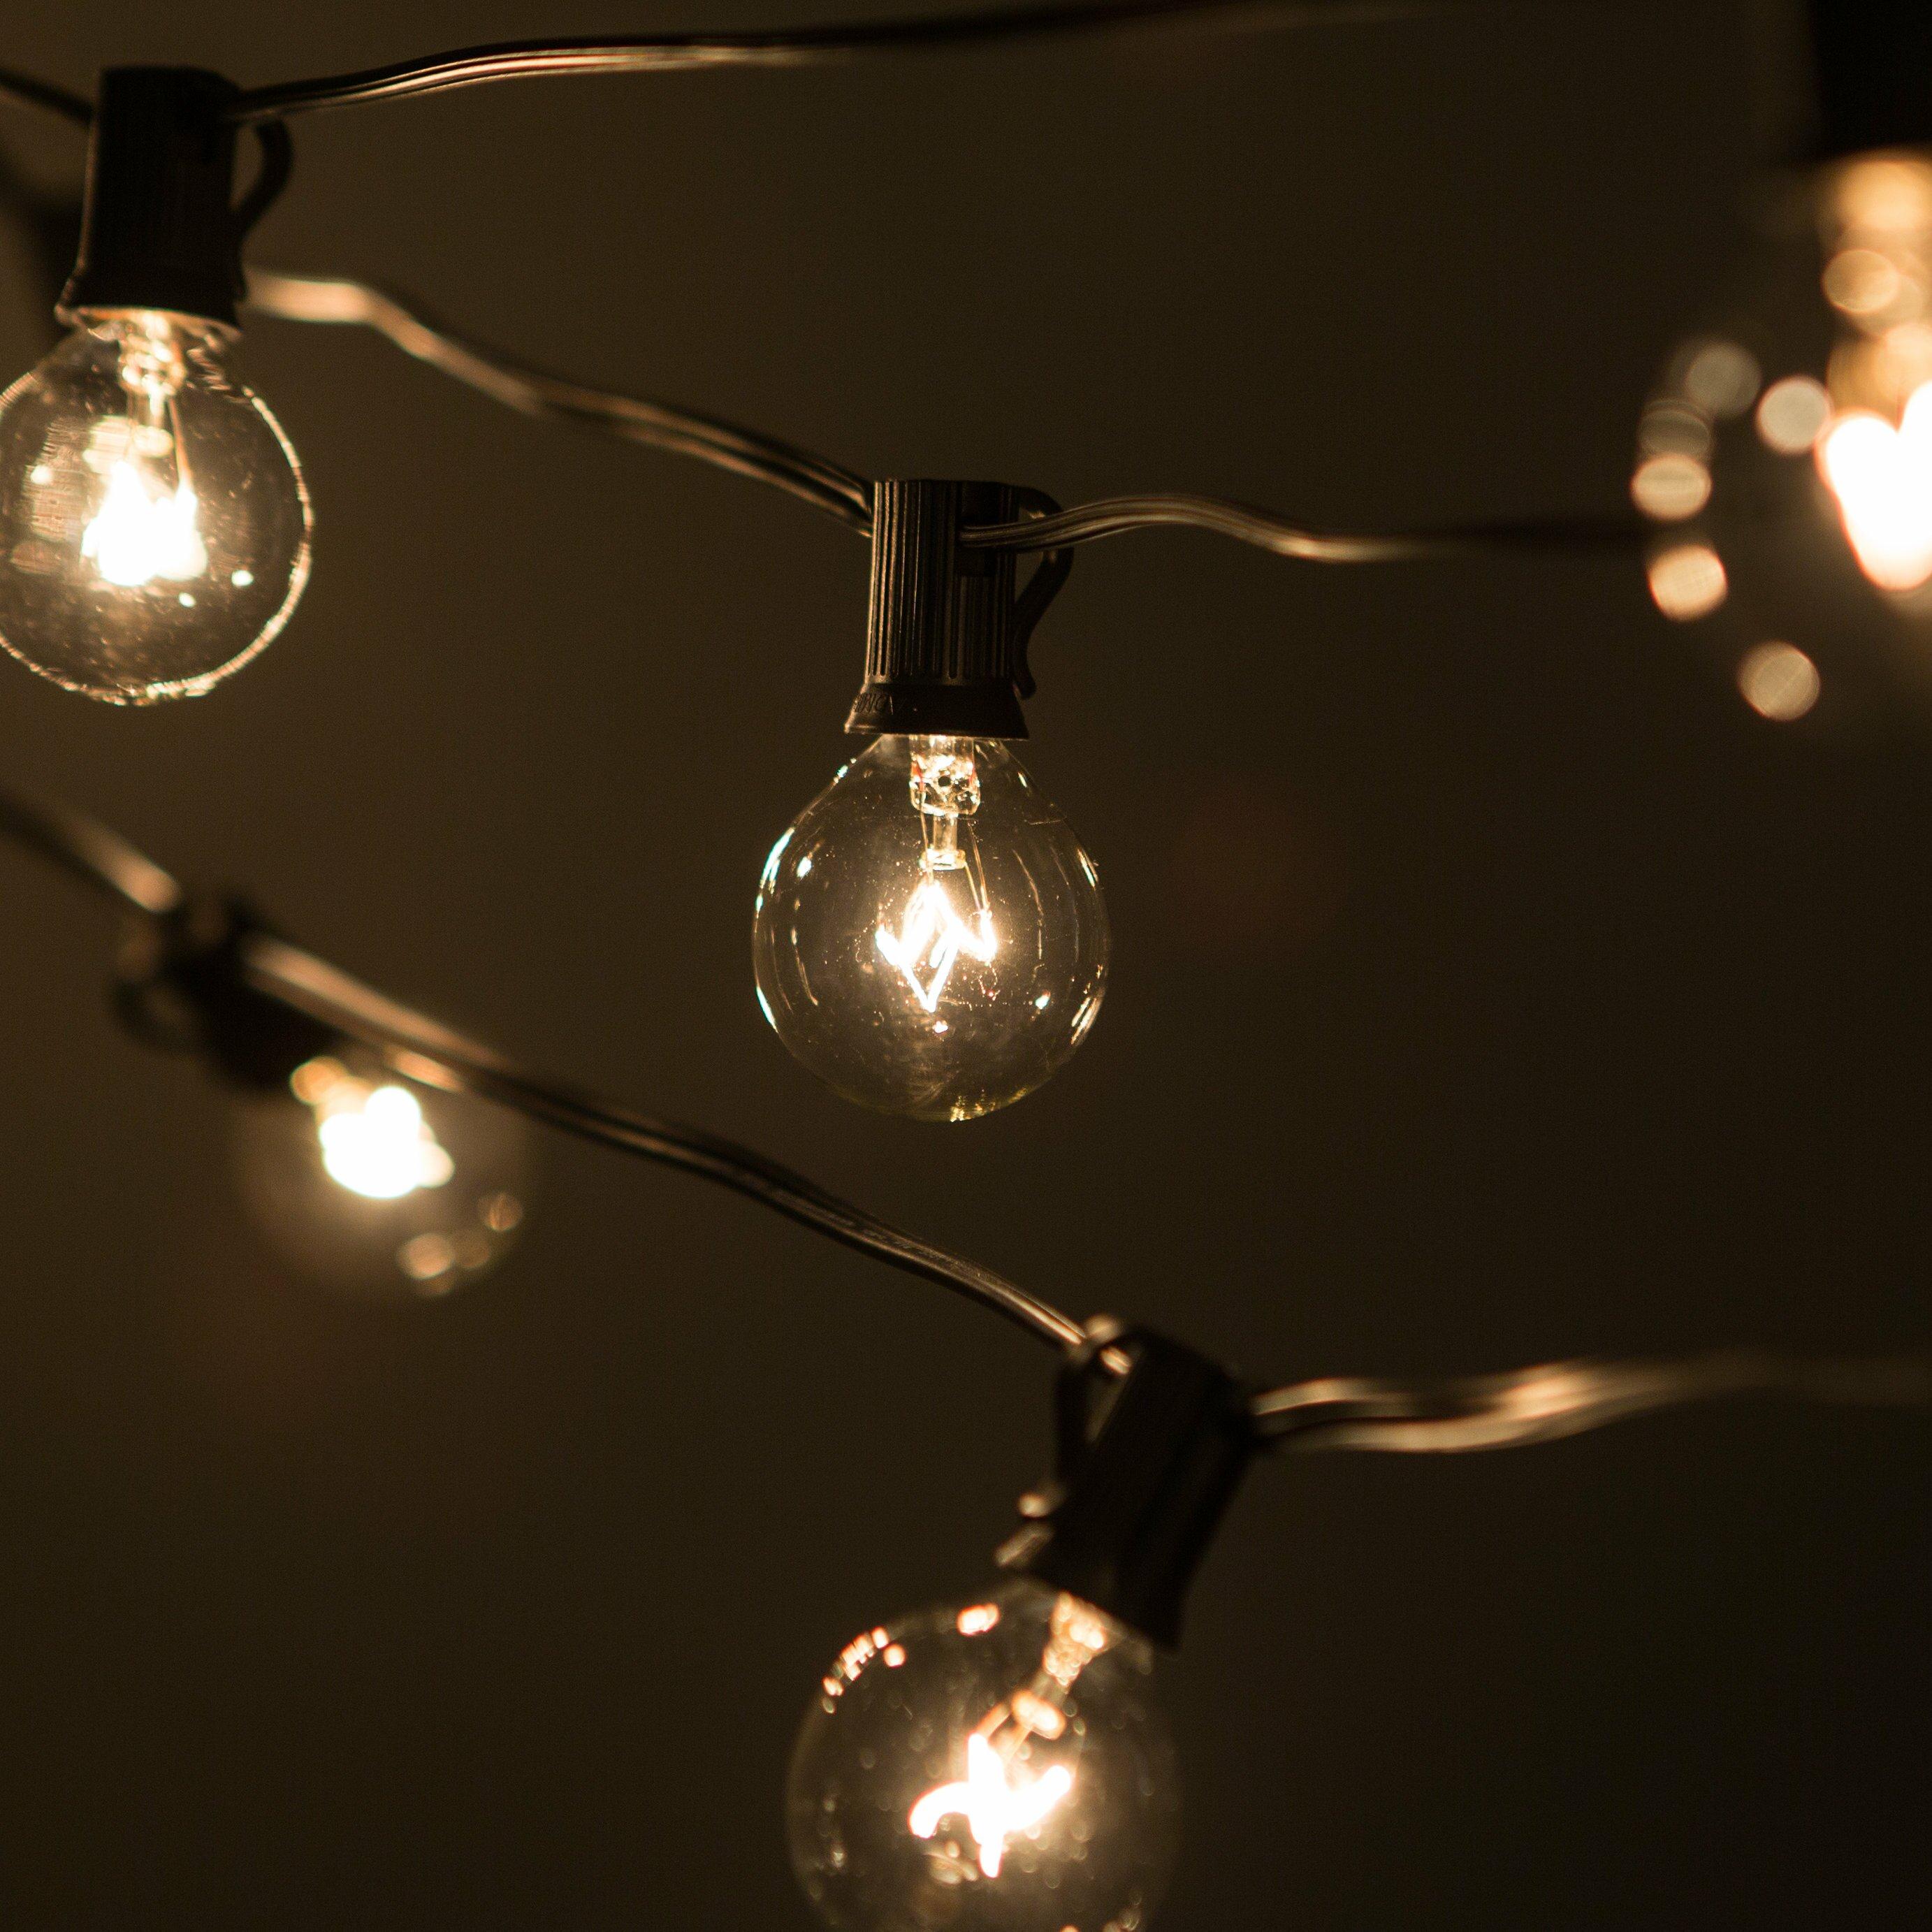 Globe String Lights 50 Ft : Laurel Foundry Modern Farmhouse Jaime 50-Light 50 ft. Globe String Lights & Reviews Wayfair